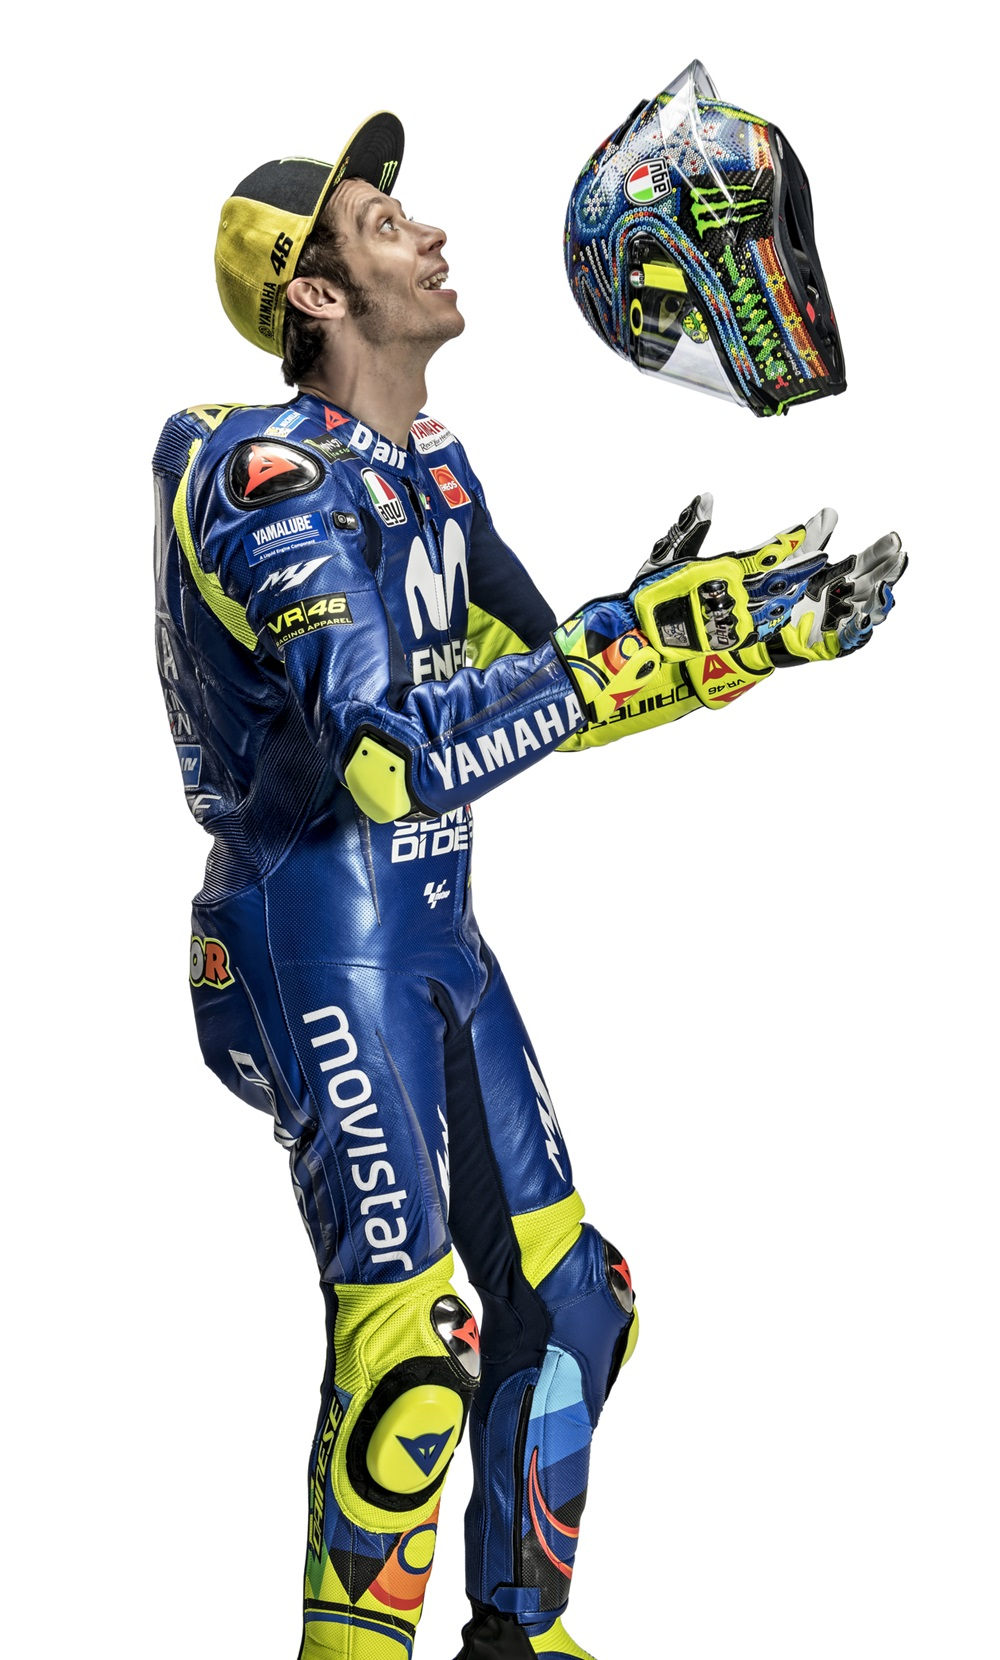 Tak cuma andal di Moto GP, ini 5 bakat tersembunyi Valentino Rossi berbagai sumber